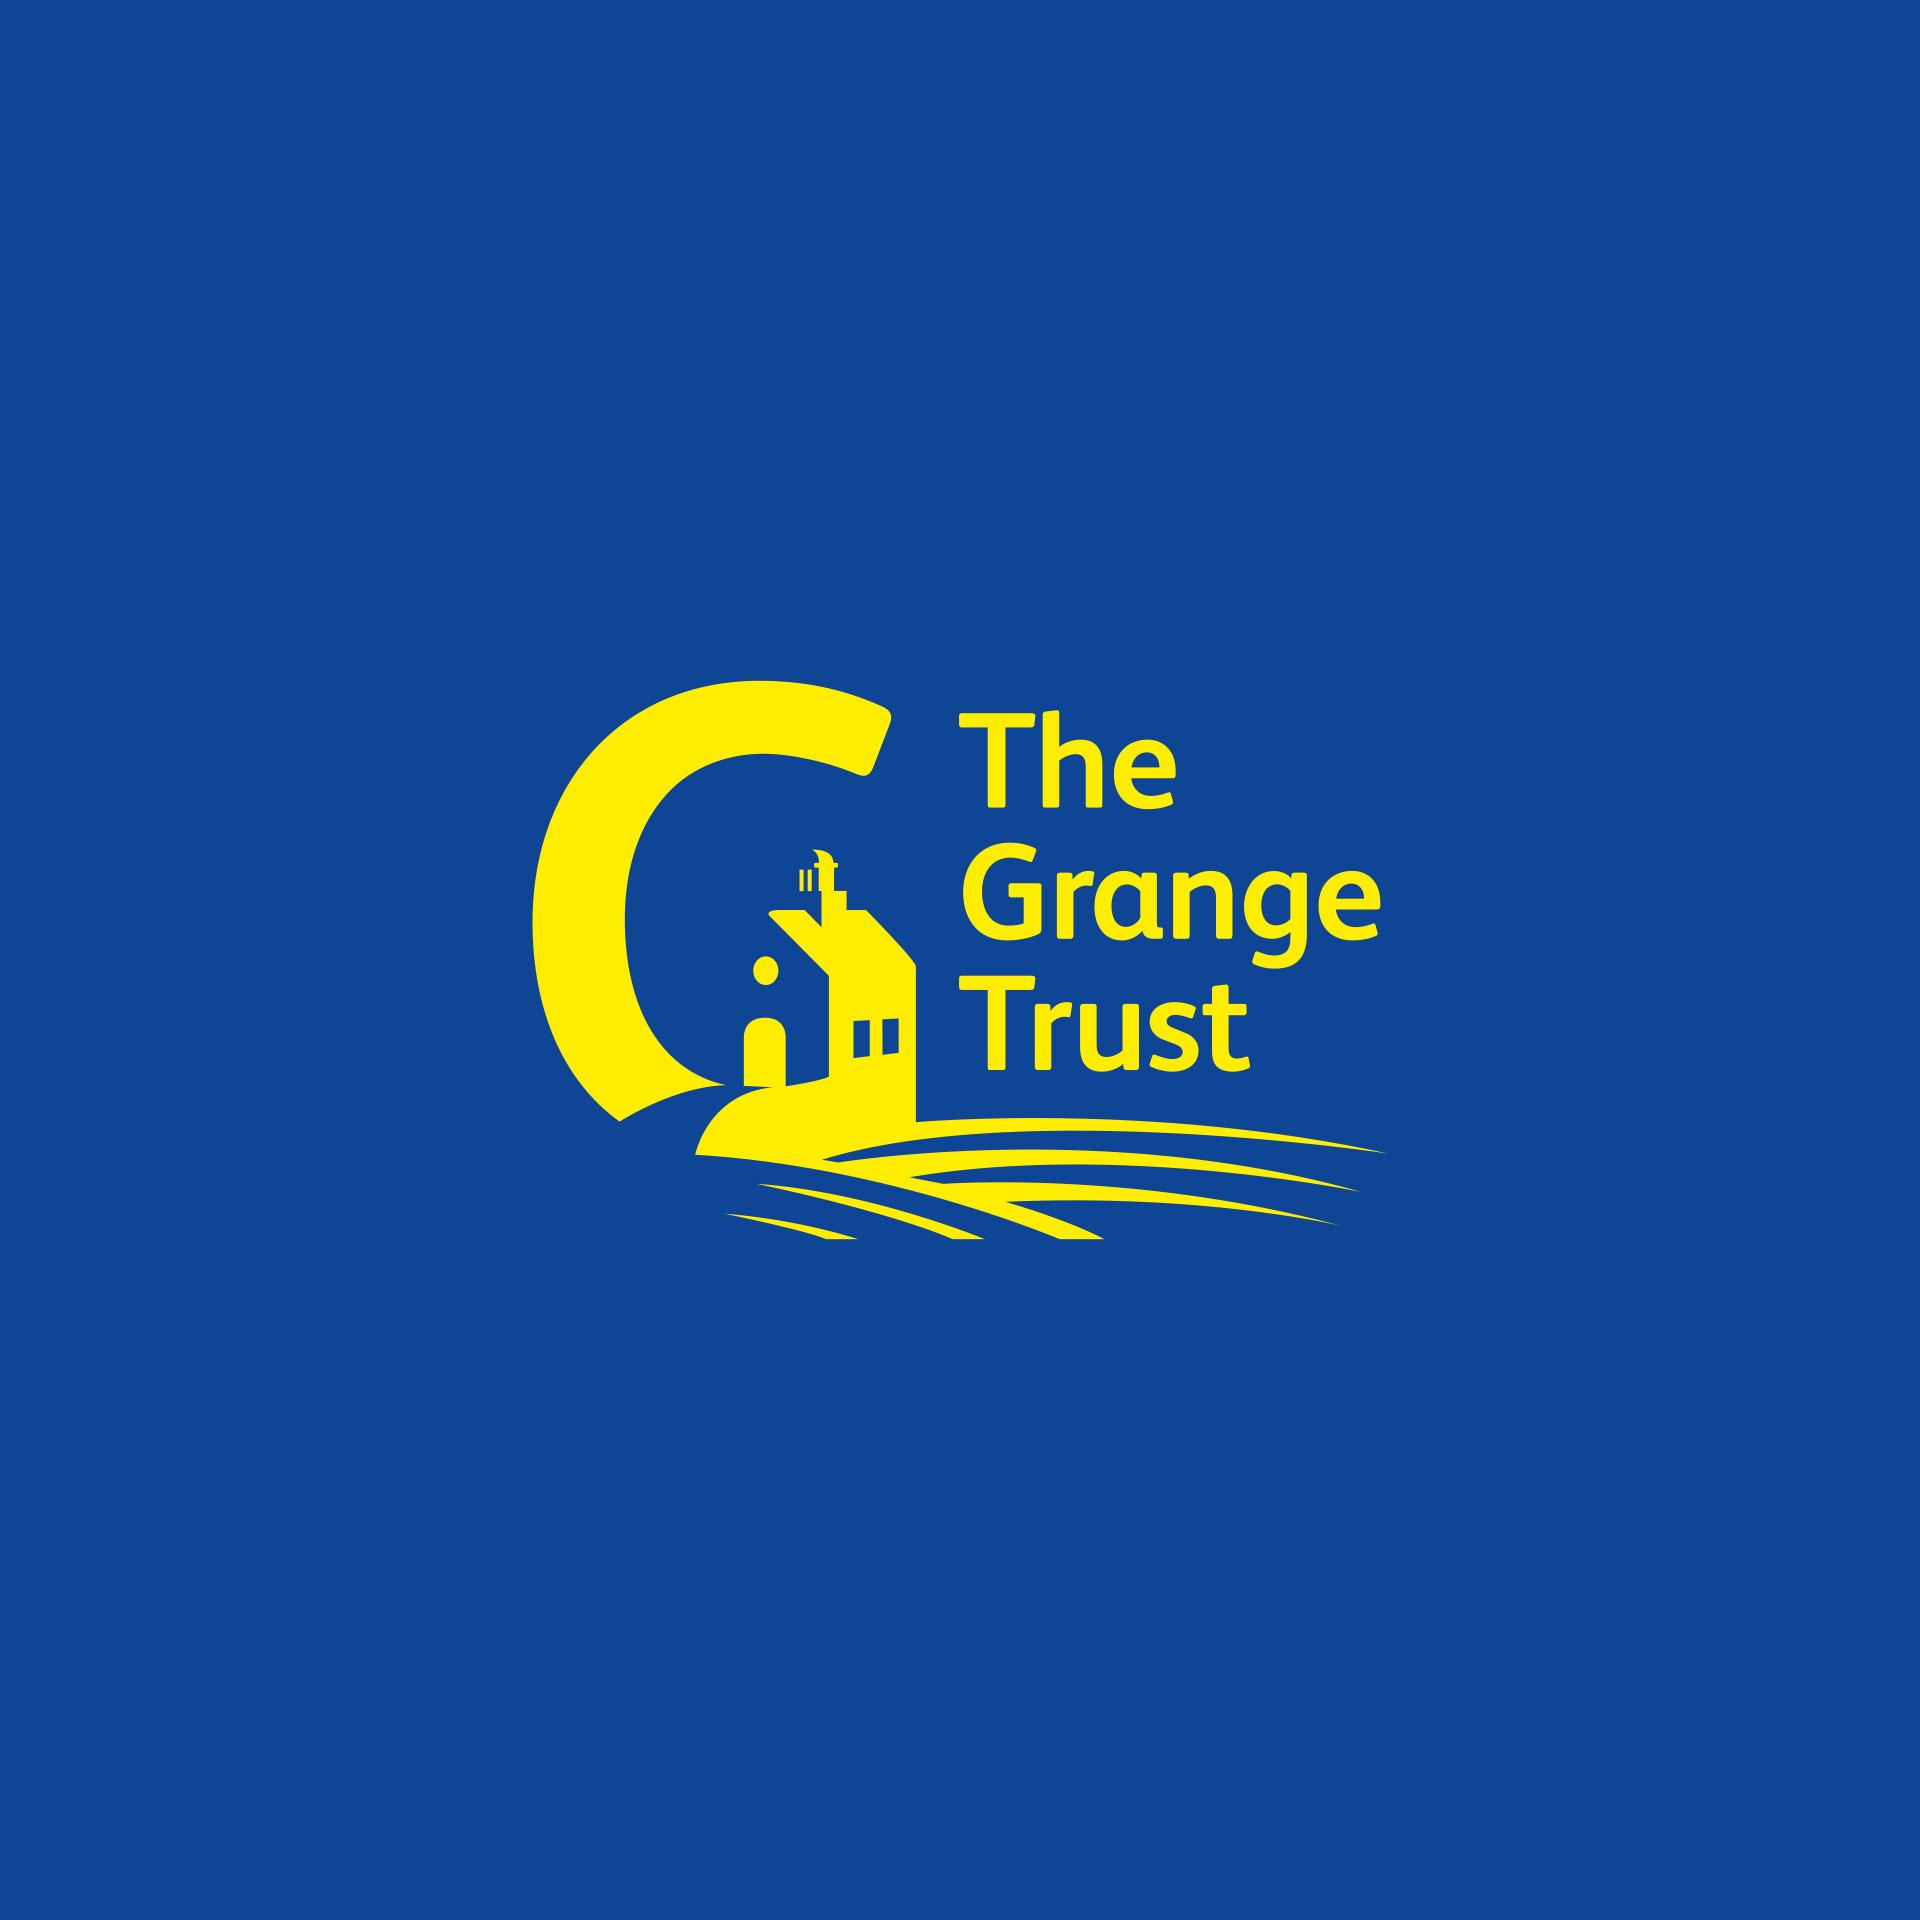 Idea Creative Design Studio Graphic Design Digital Design Website Design Photography Video Production South Yorkshire Rotherham Sheffield Manchester The Grange Trust Logo 3